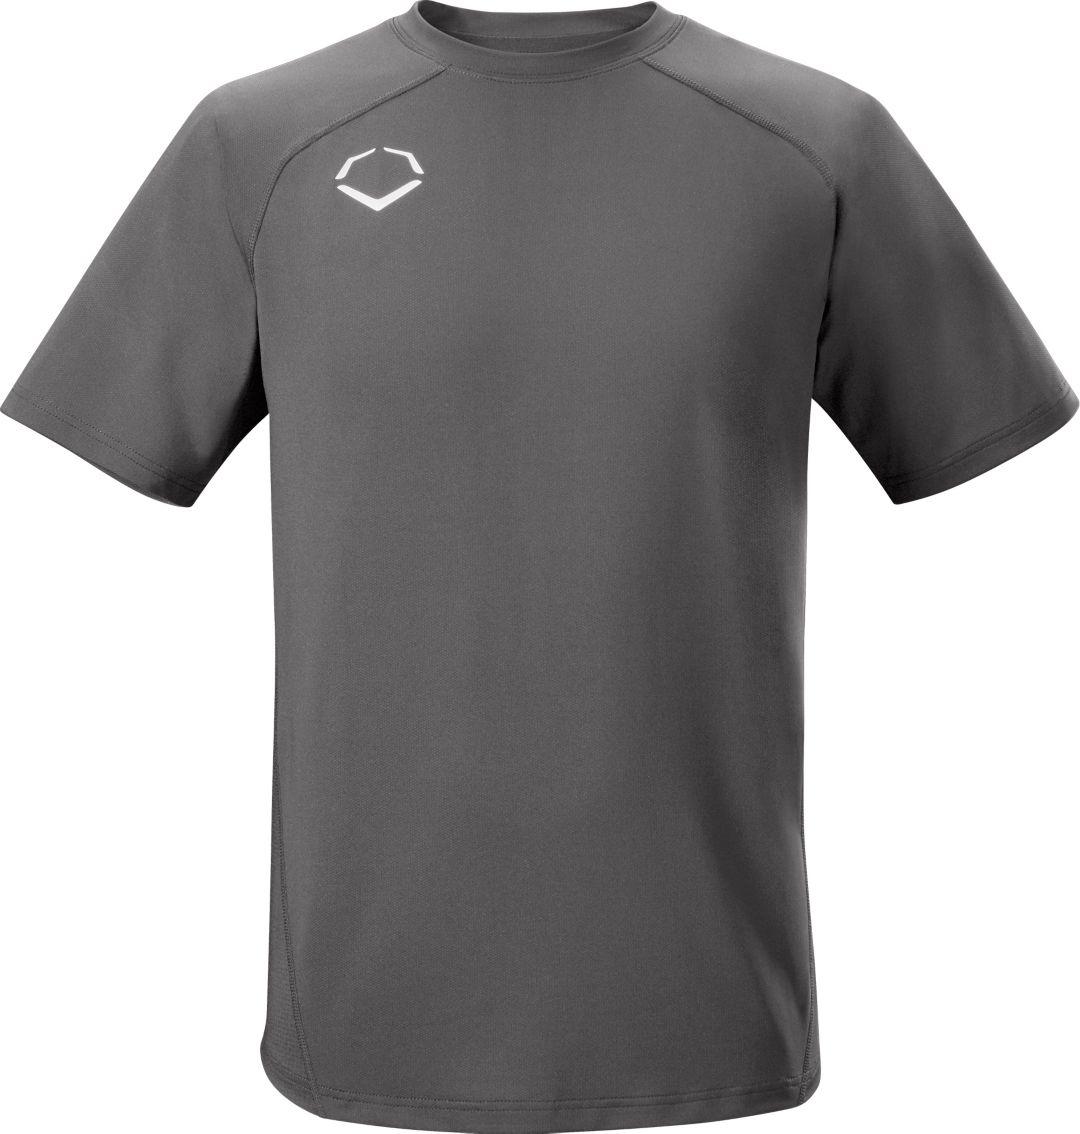 a8a8b9fcf6f7 EvoShield Boys' Pro Team Training T-Shirt   DICK'S Sporting Goods